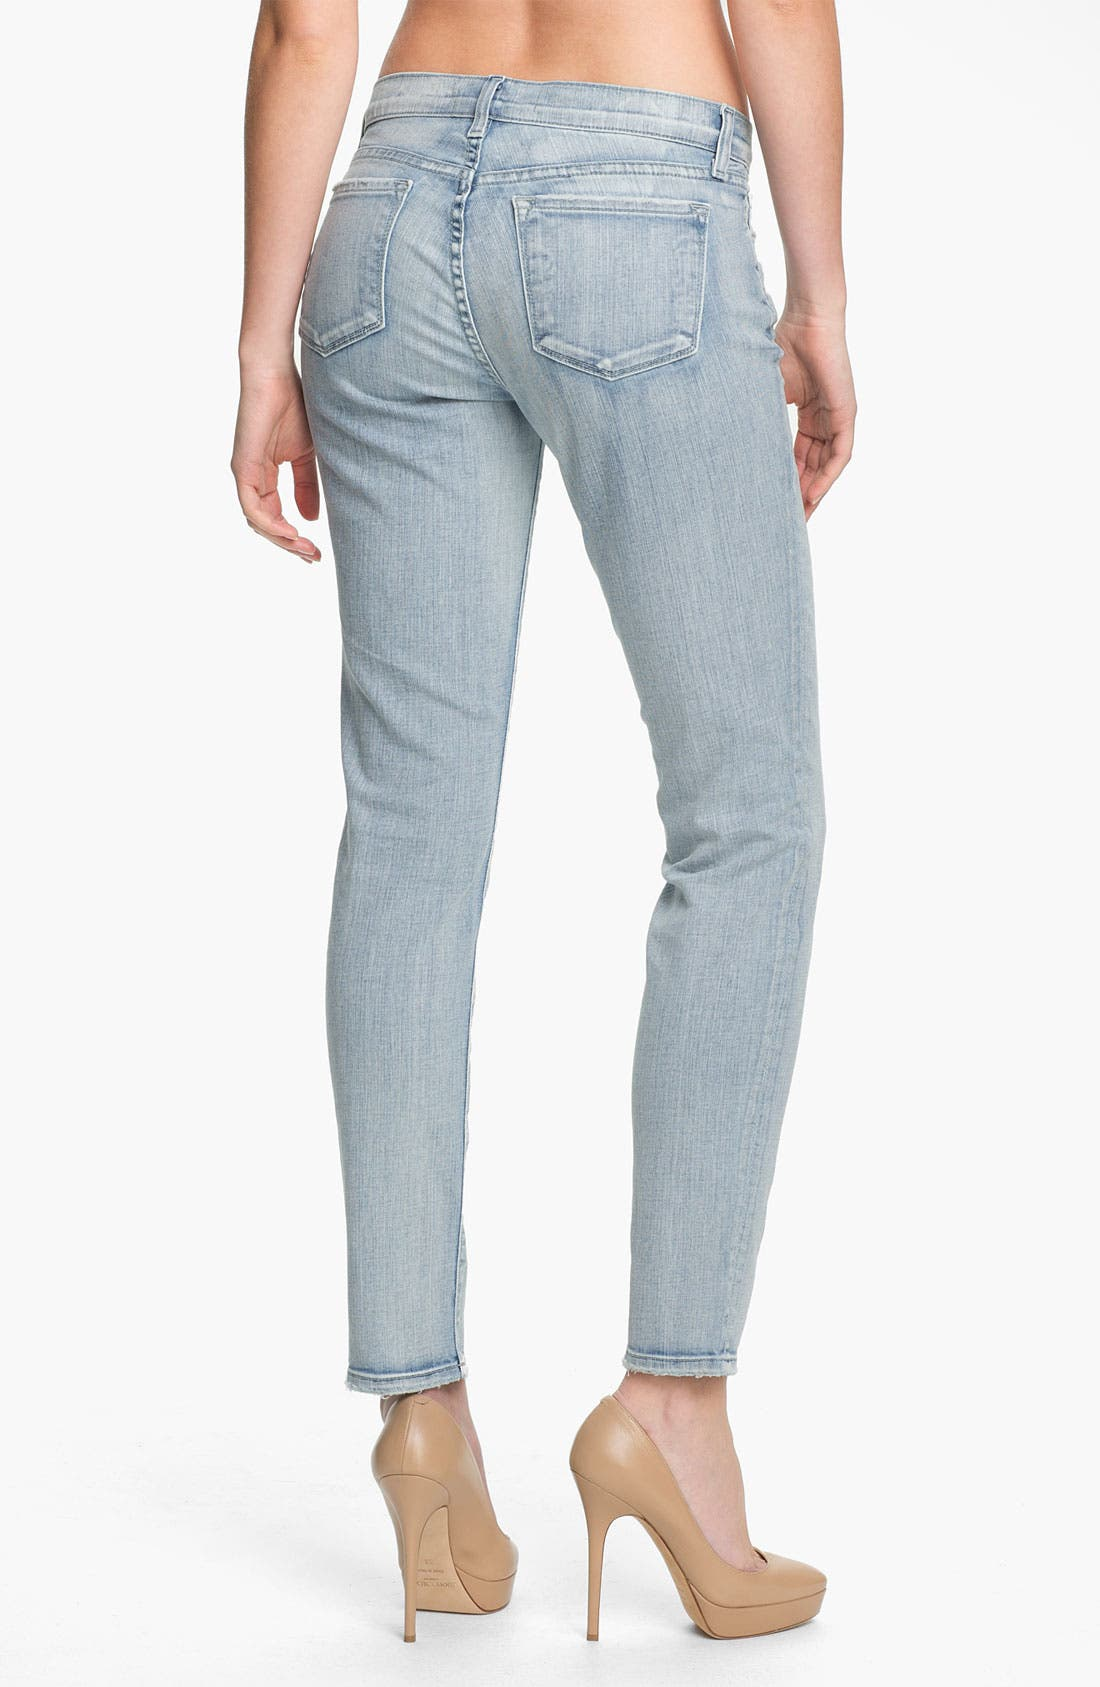 Alternate Image 2  - J Brand '811' Skinny Stretch Jeans (Afterlife)